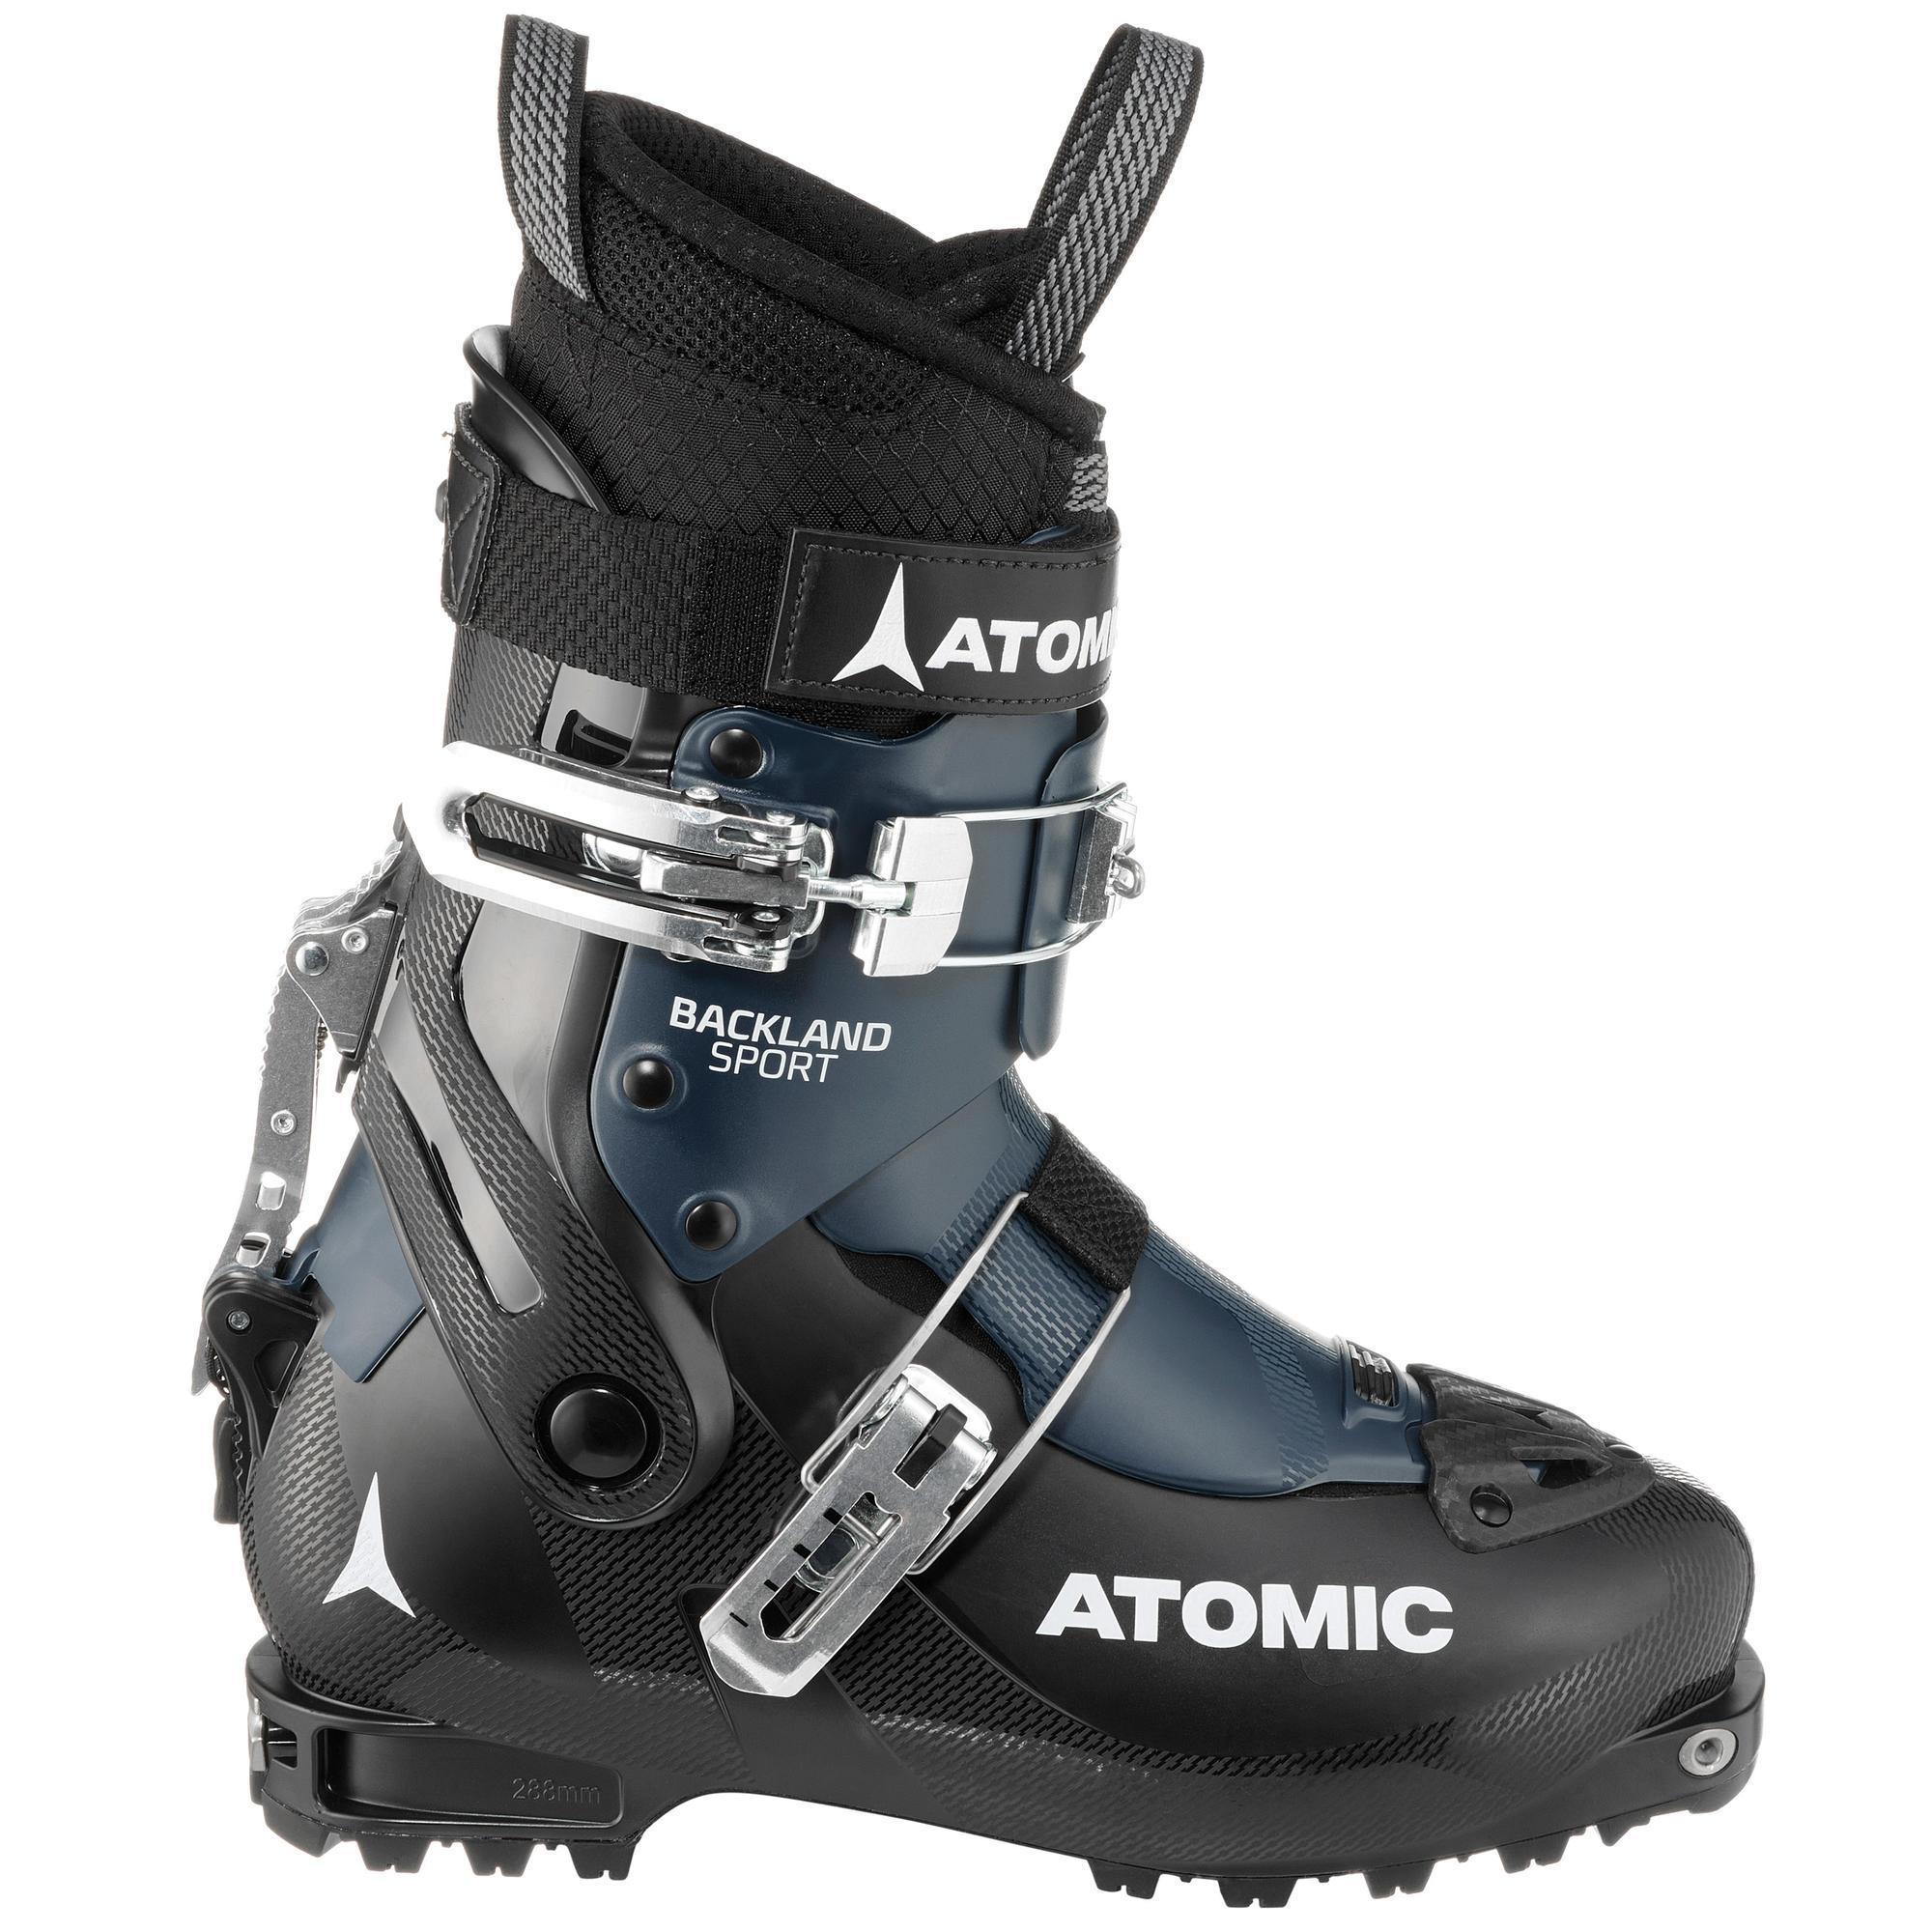 Ski touring boots Atomic Backland Sport